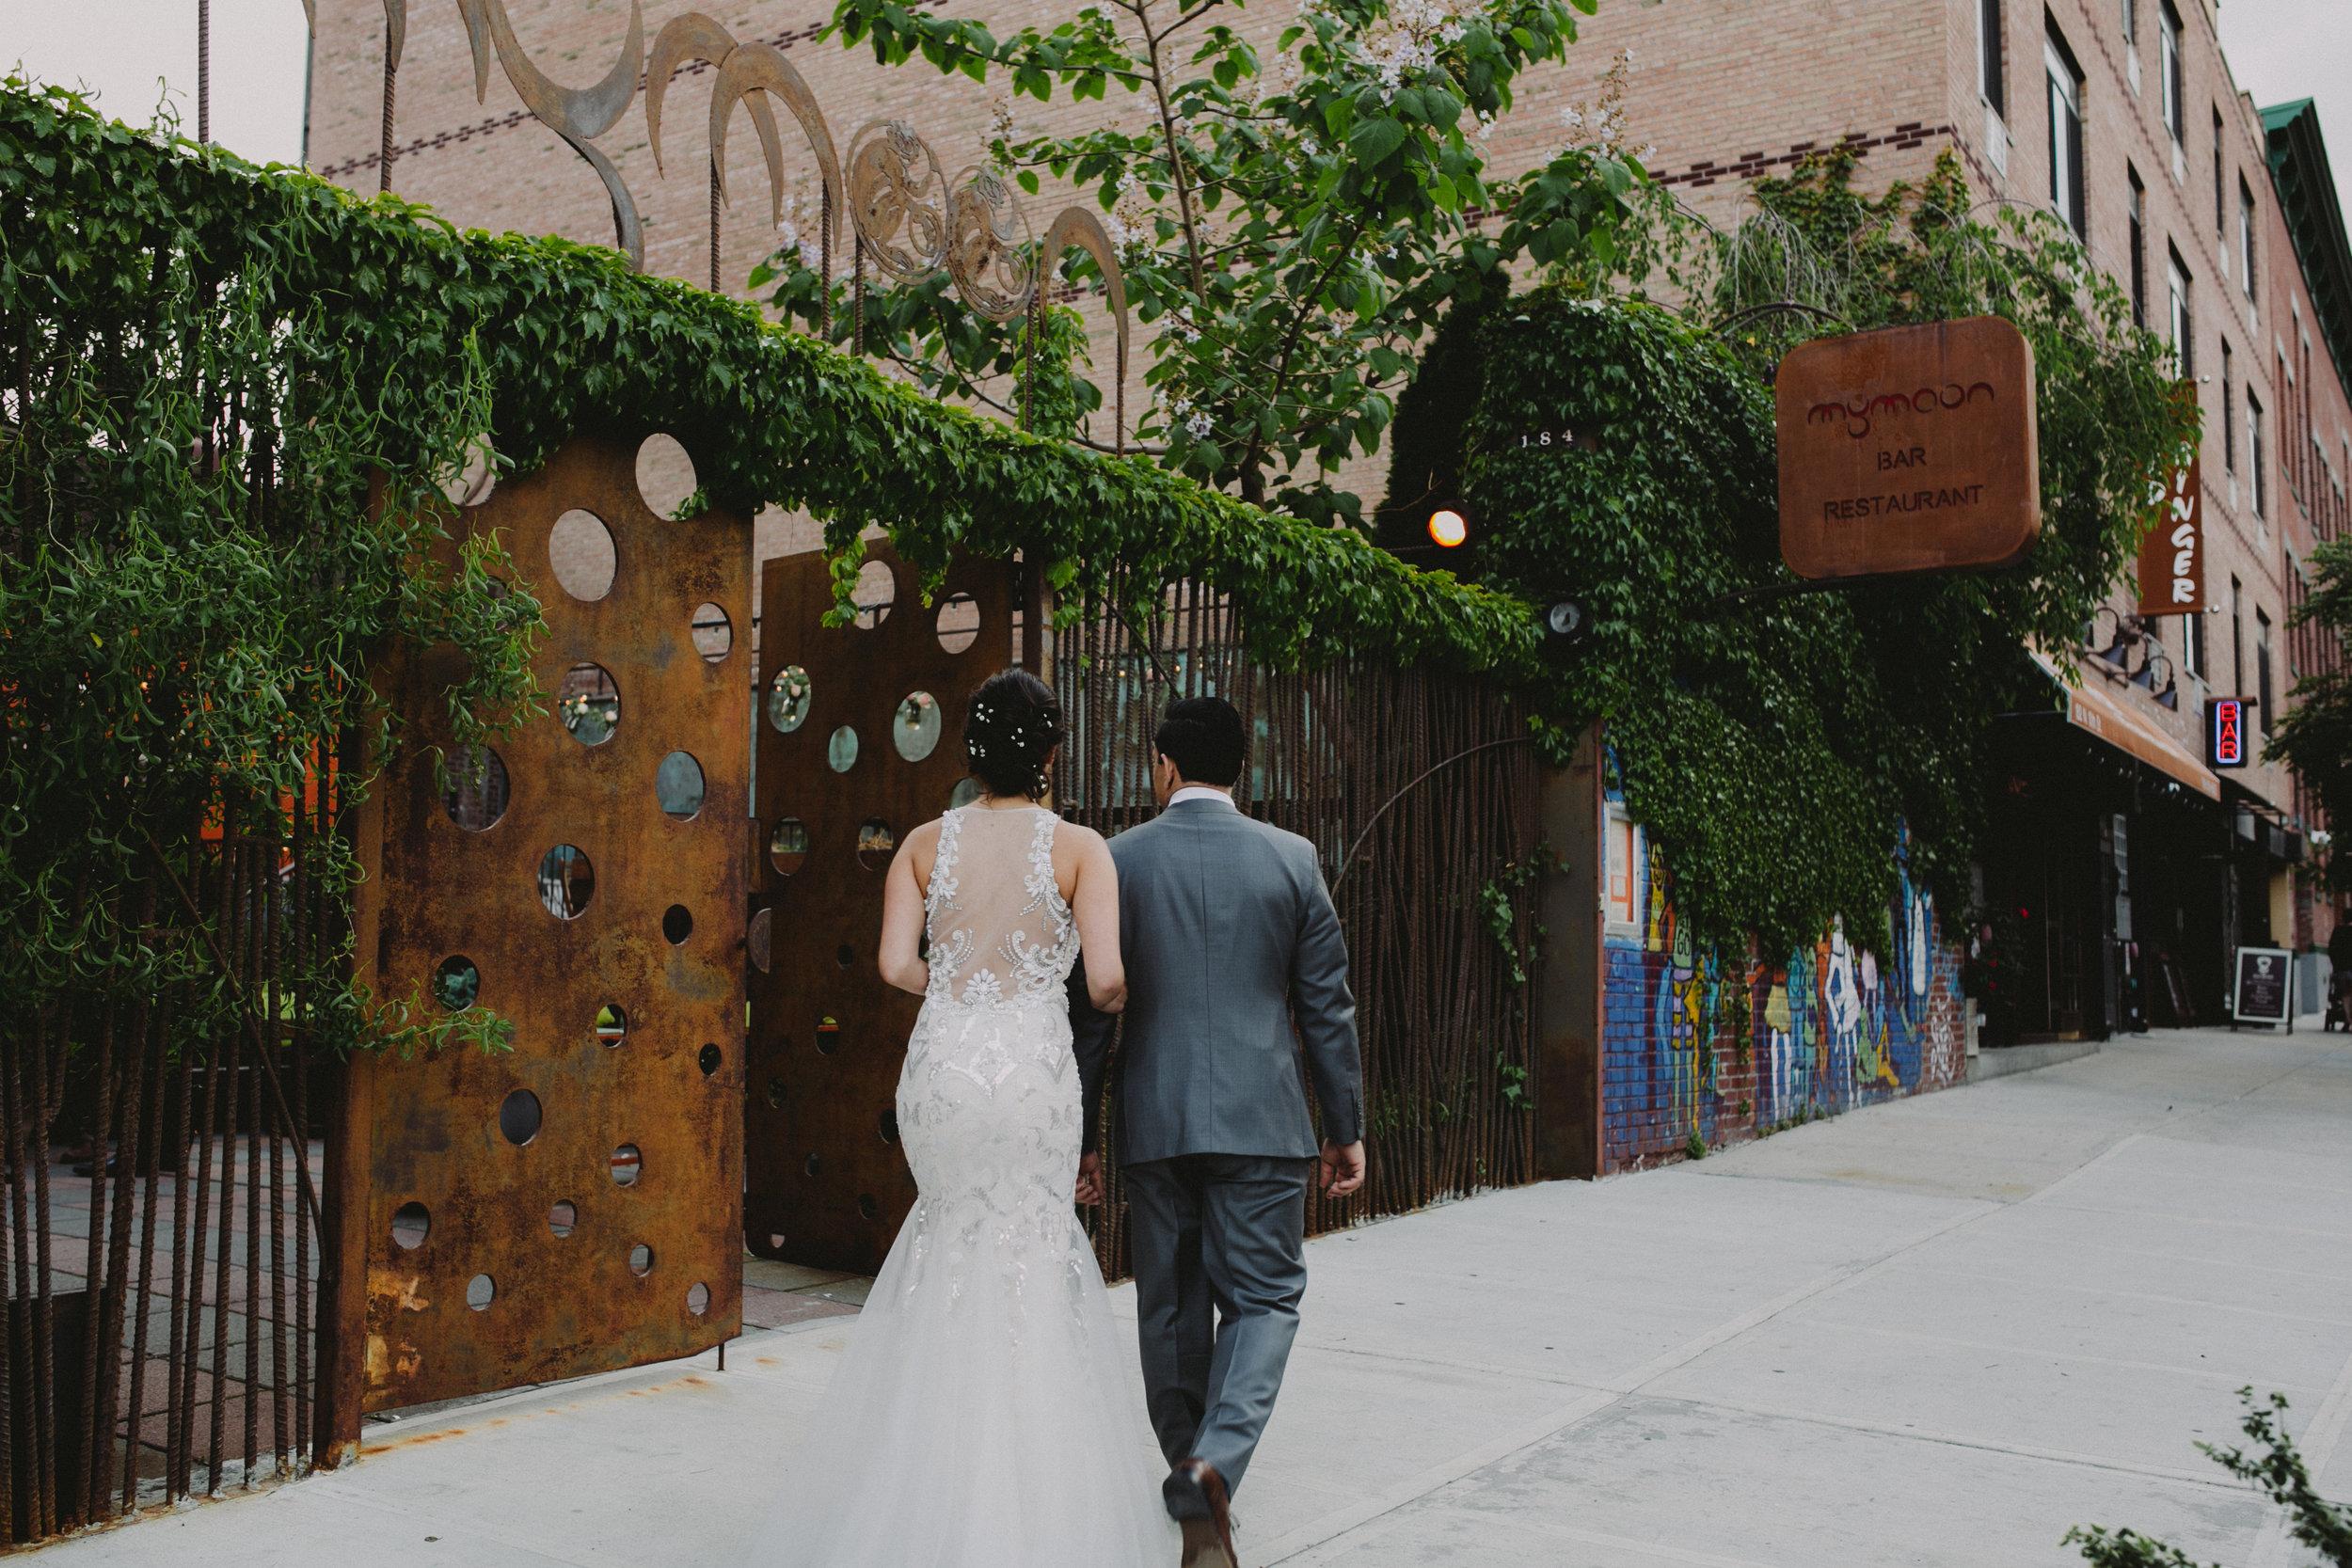 MY_MOON_WILLIAMSBURG_WEDDING 2486.jpg